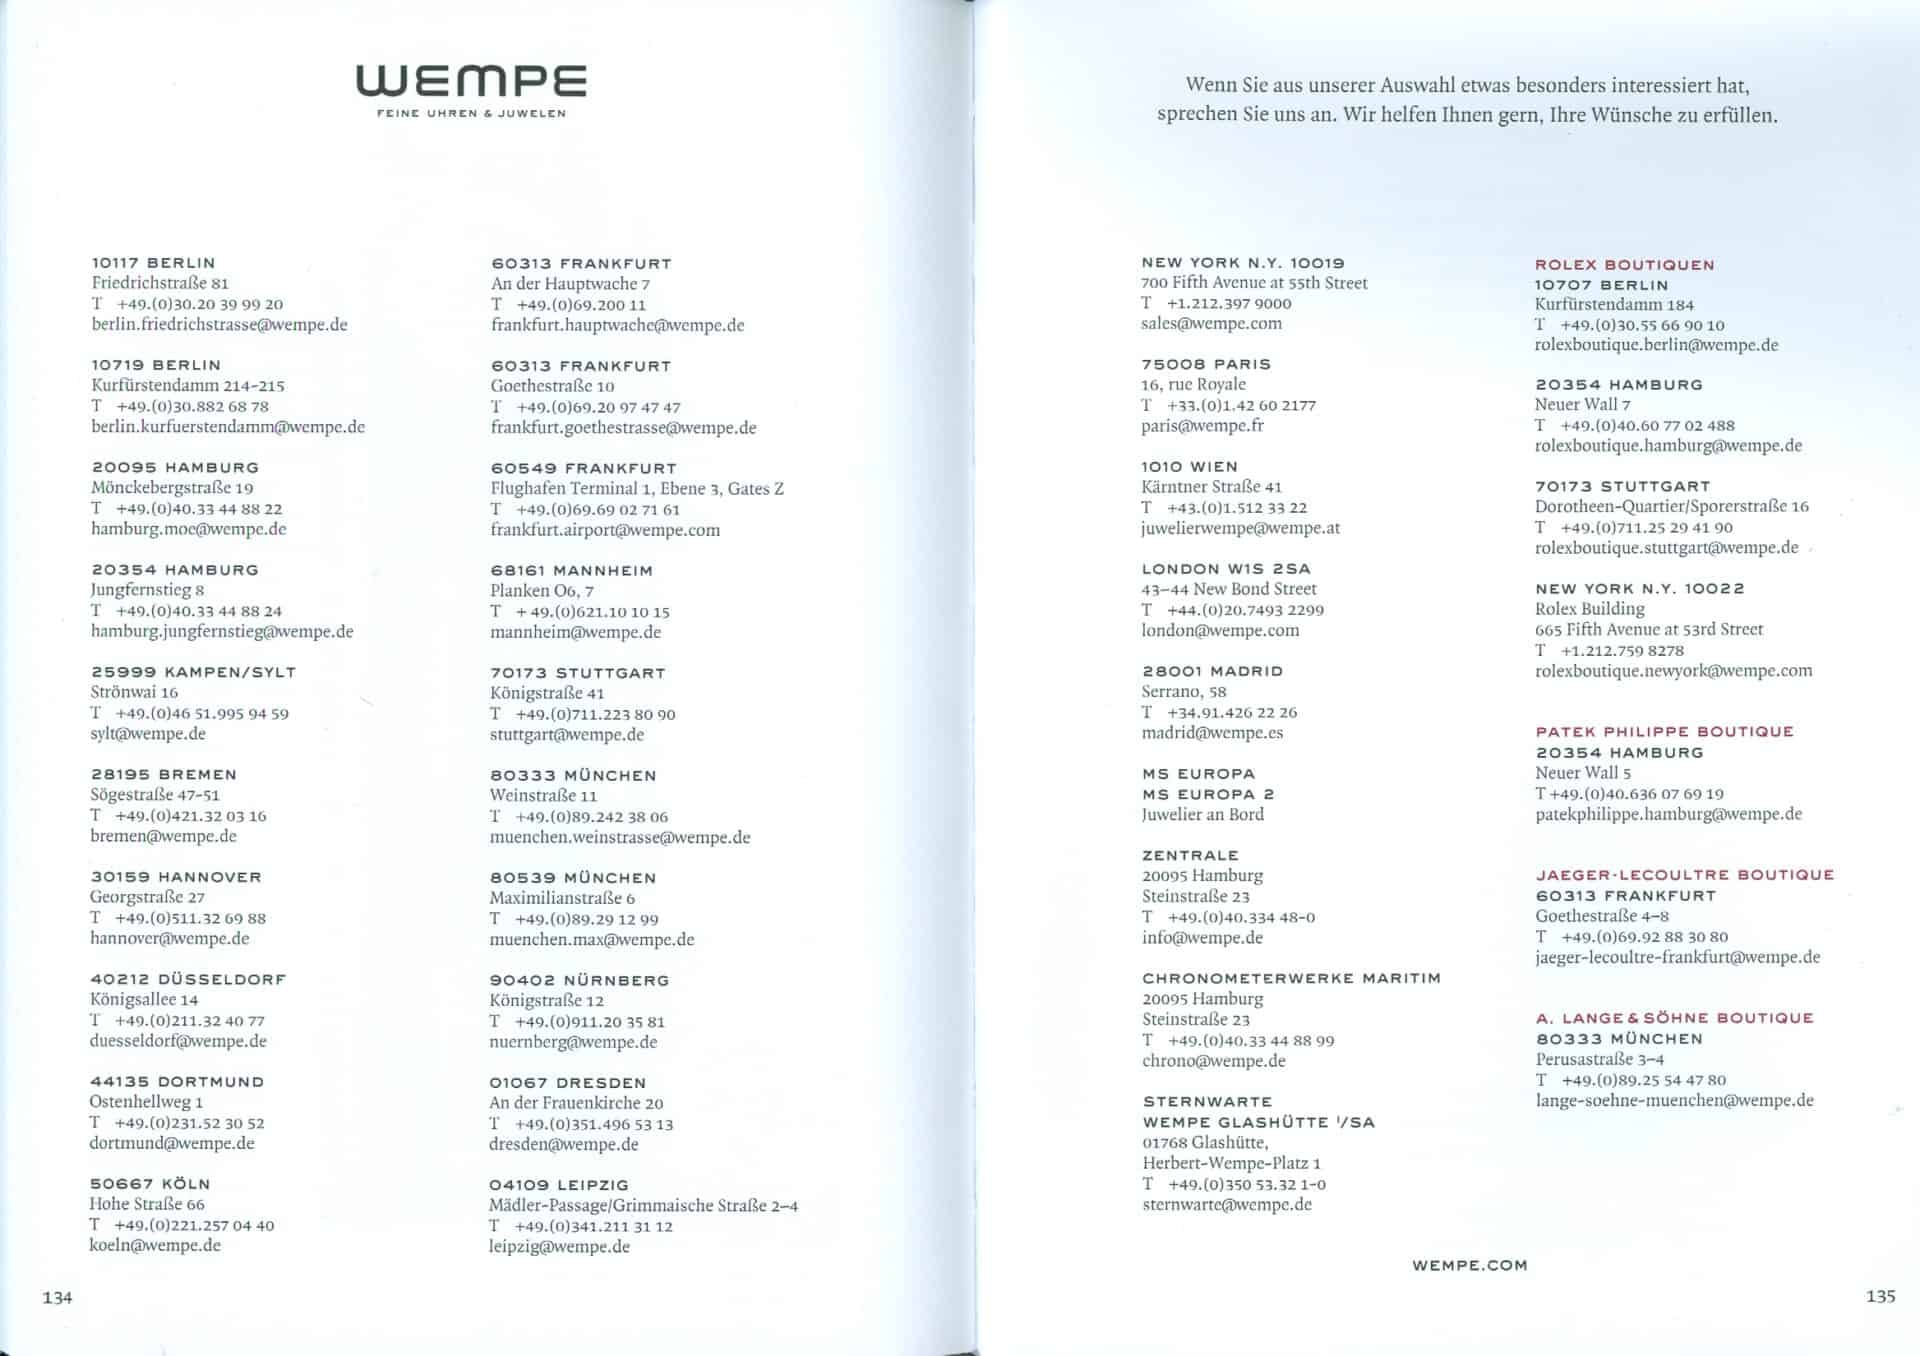 Wempe Meisterwerke 2018 19 08 Filialen